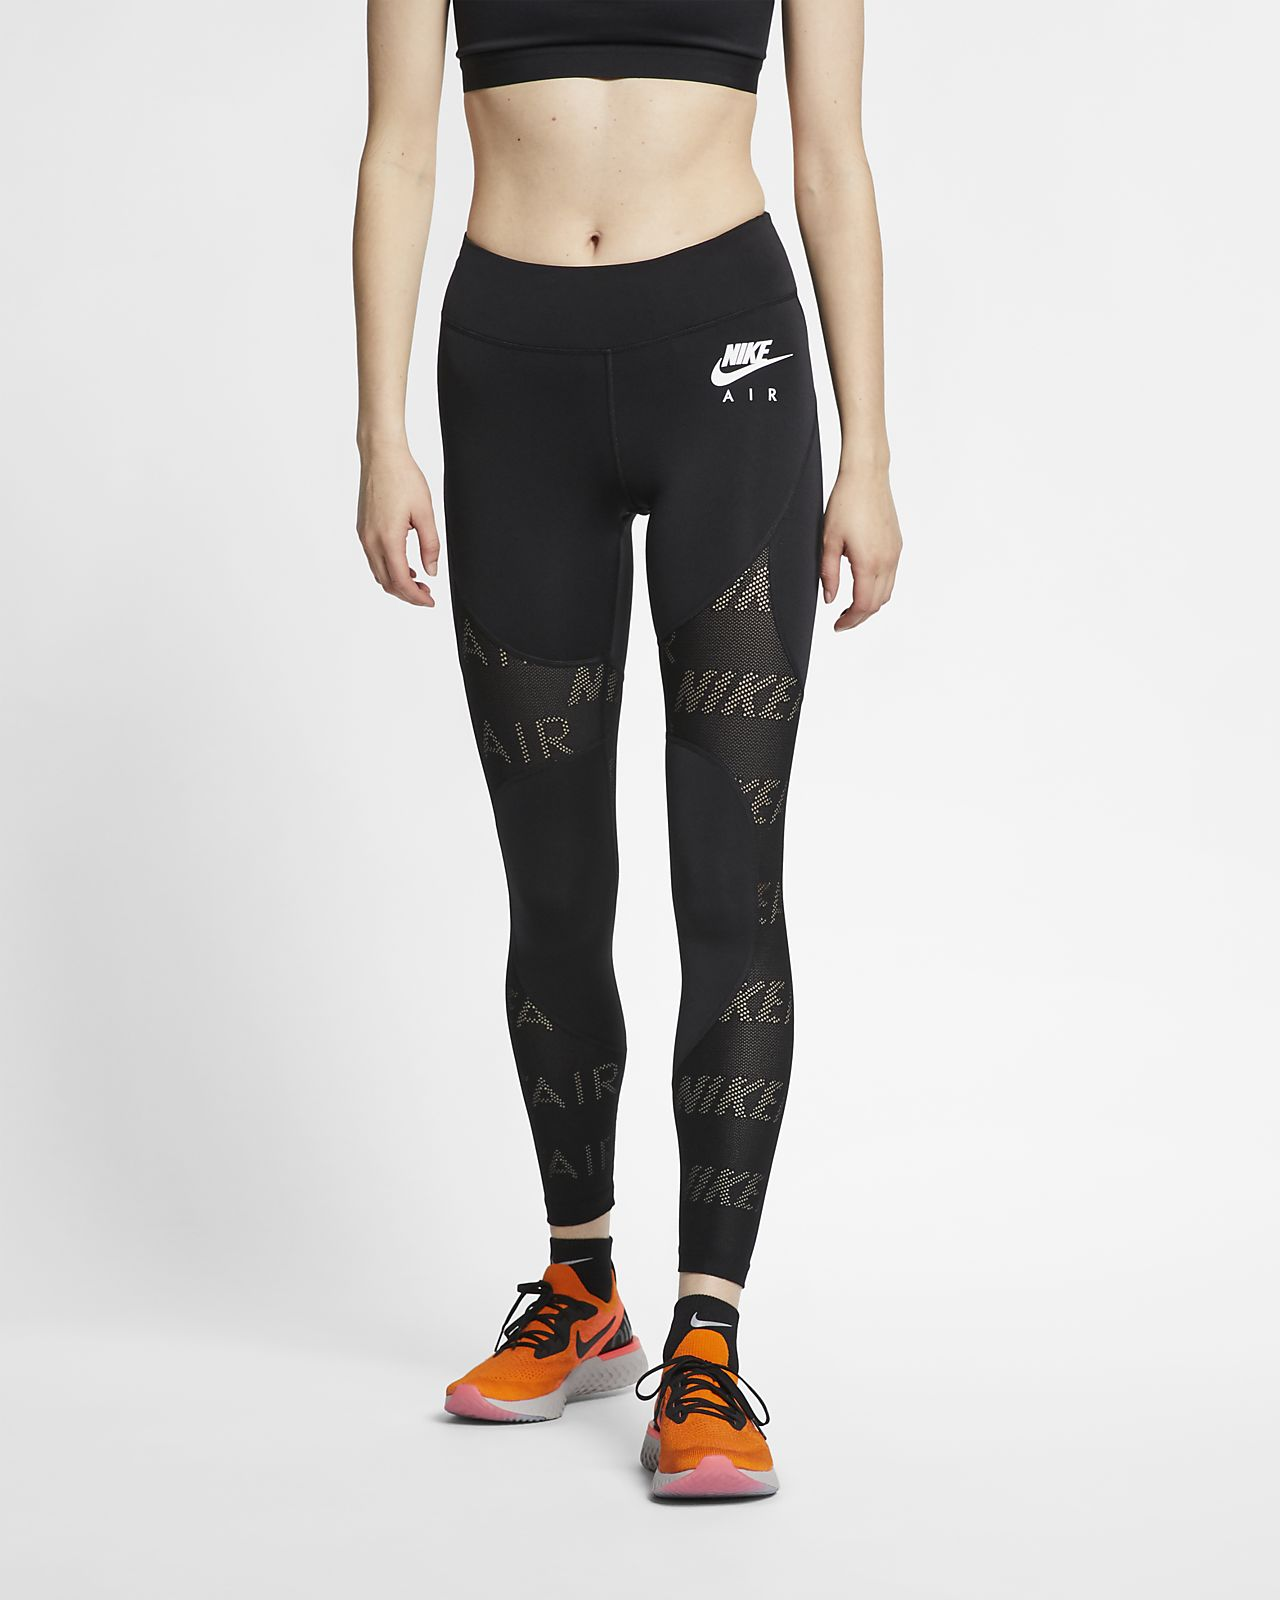 Nike 女款 7/8 跑步緊身褲